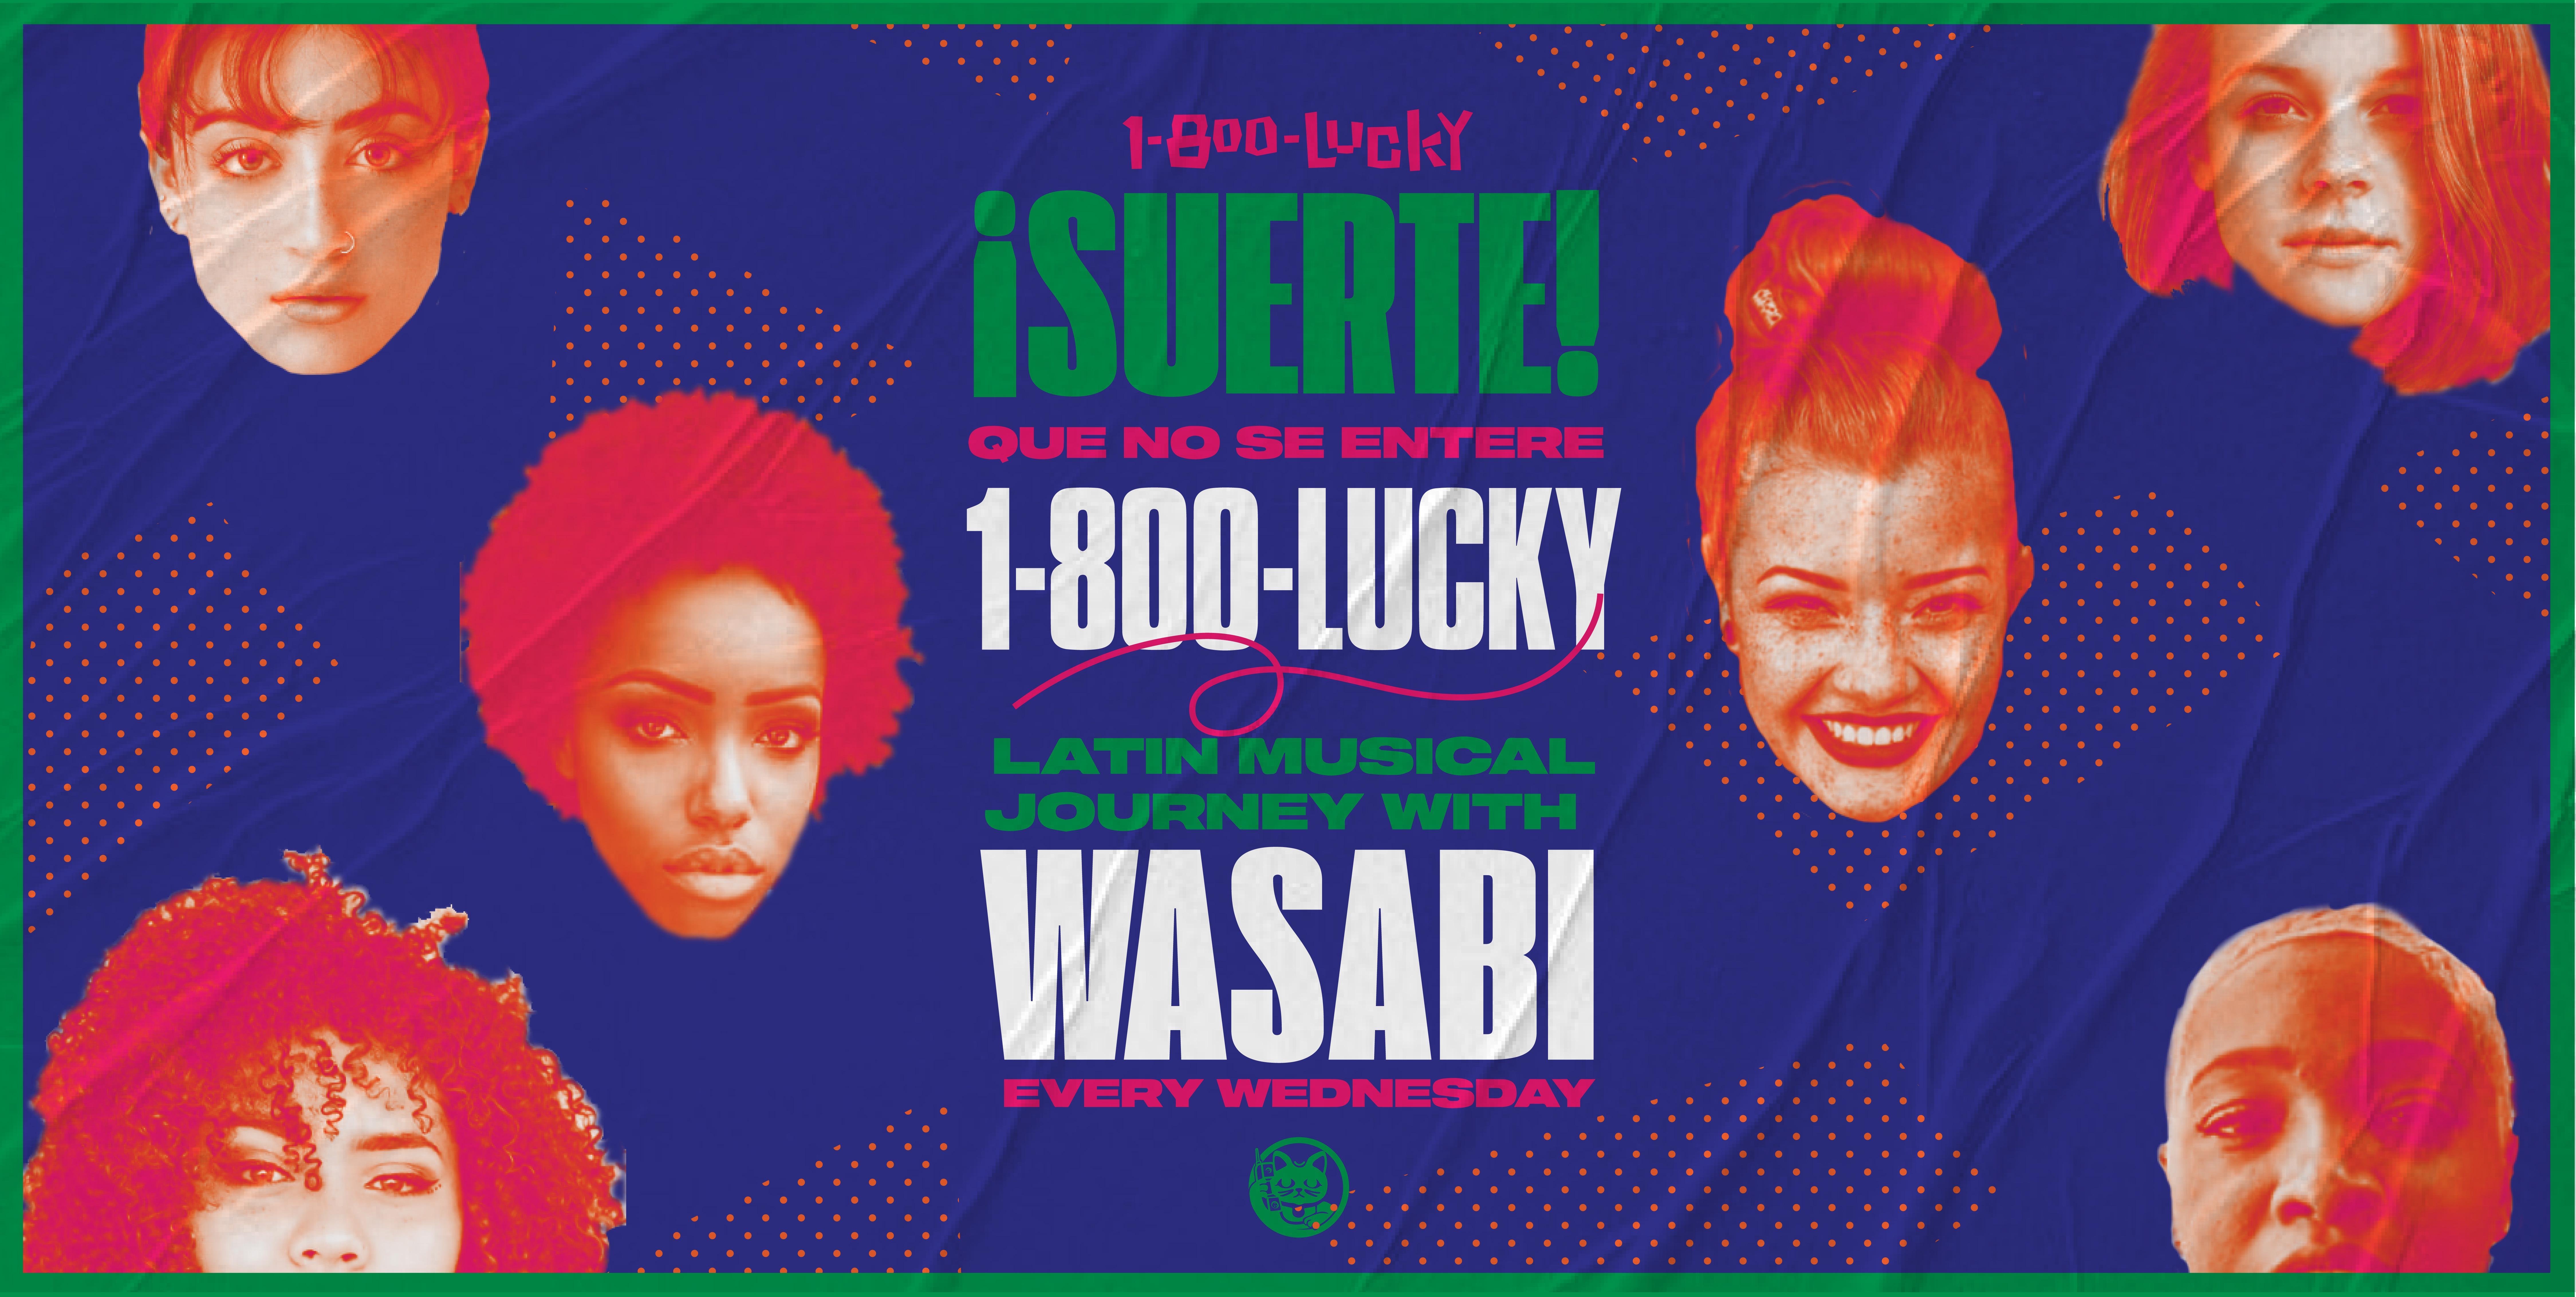 !SUERTE! Que No Se Entere LATIN MUSICAL JOURNEY with DJ WASABI